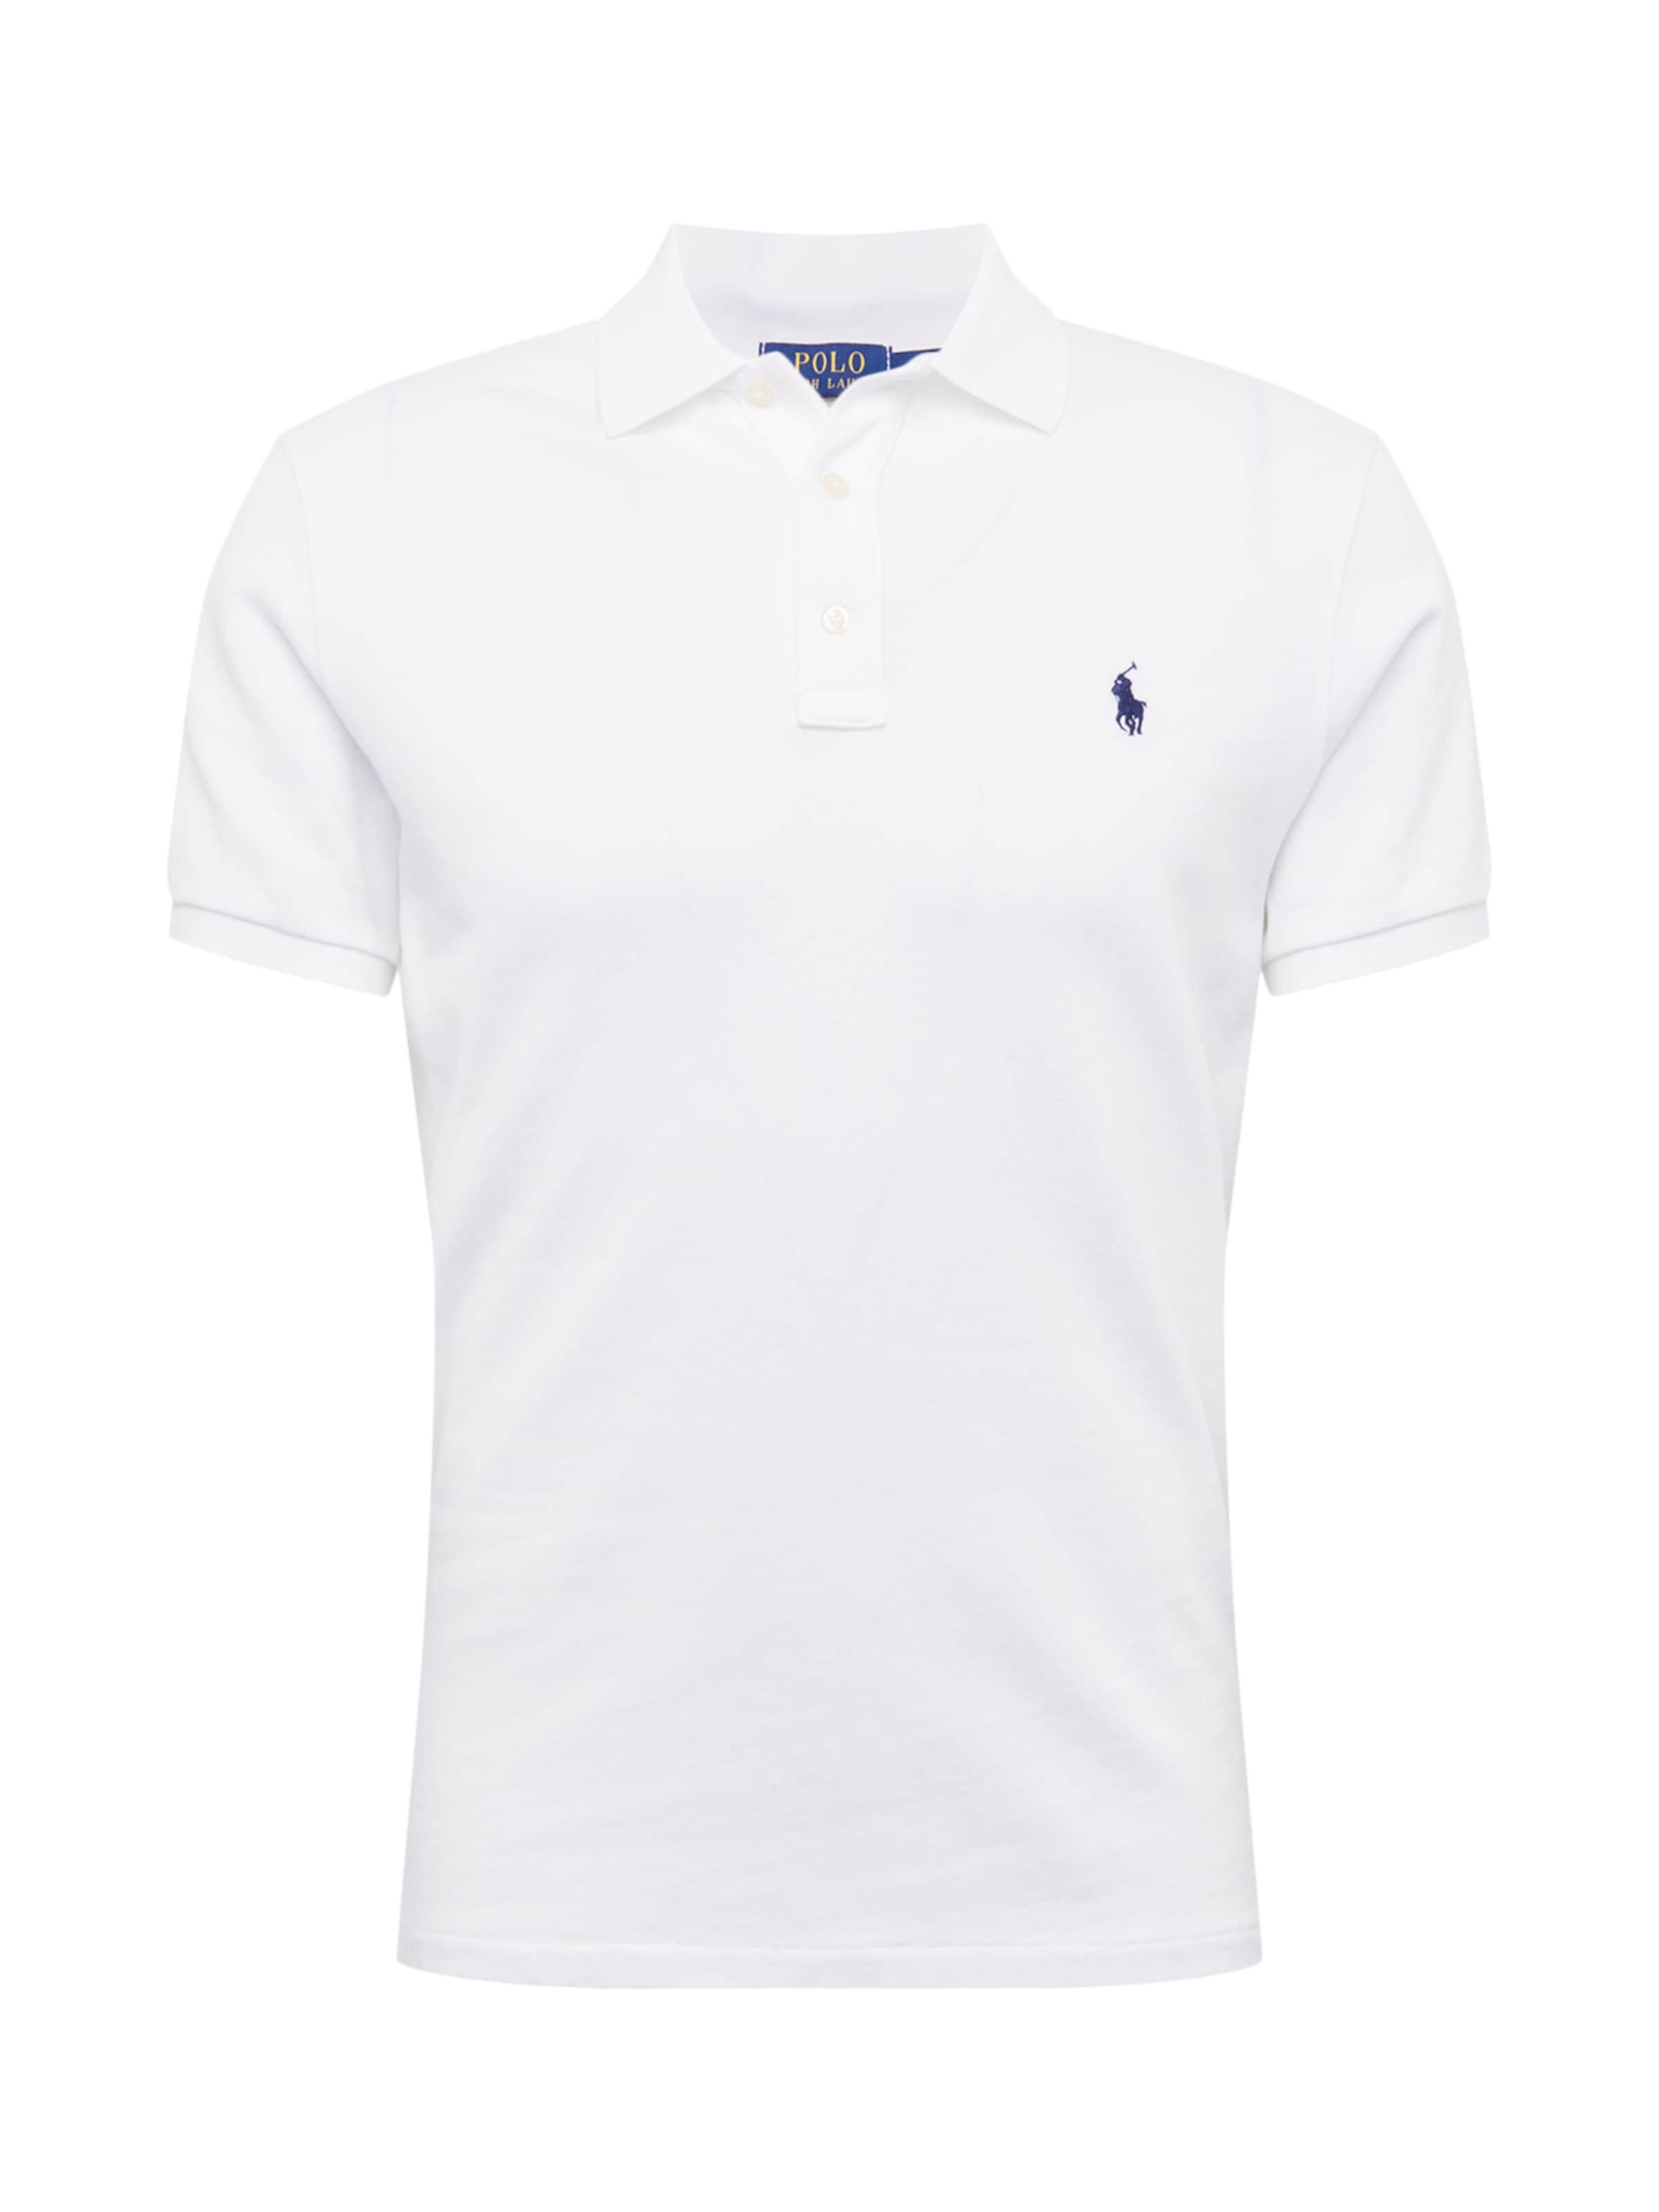 Polo knit' Ralph LaurenT shirt Sleeve In 'sskcm8 short Blanc TlFJcK13